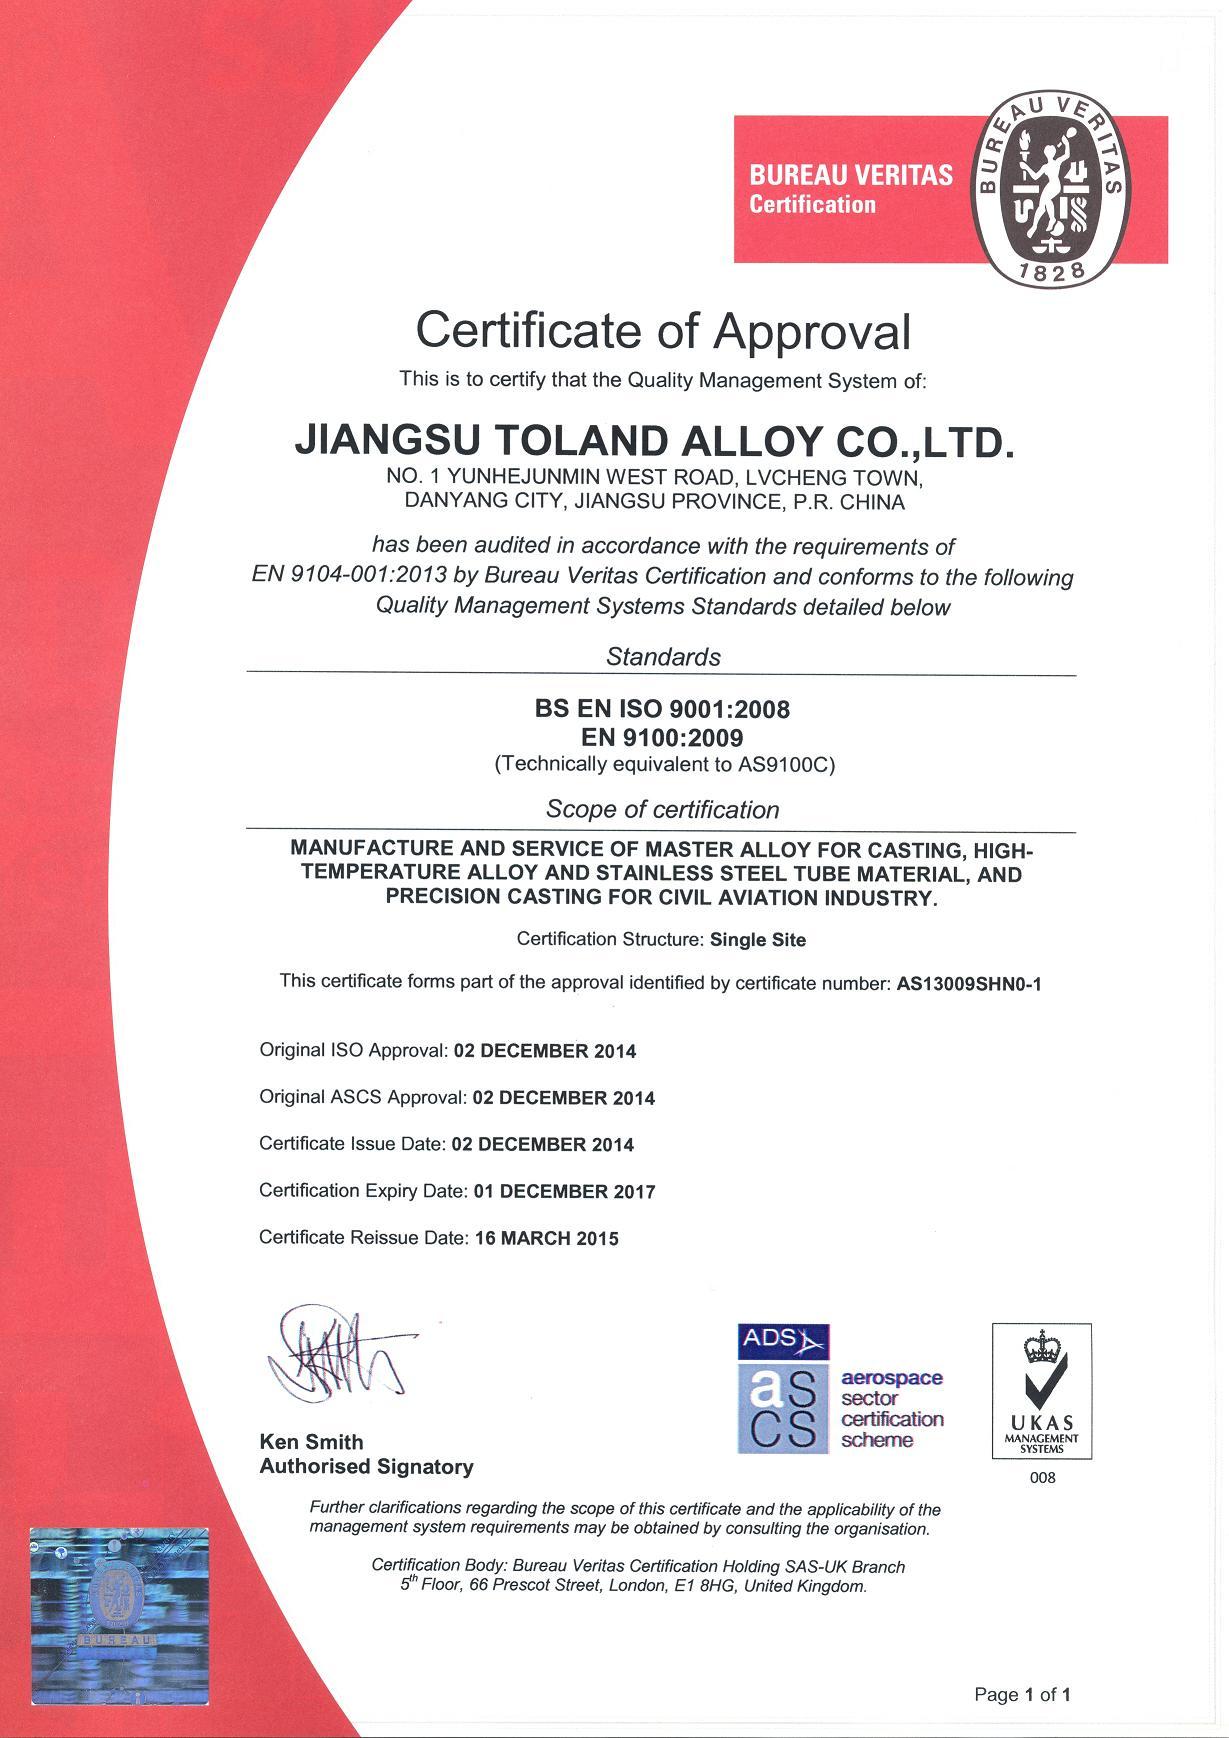 BS EN ISO 9001:2008 EN 9100:2009